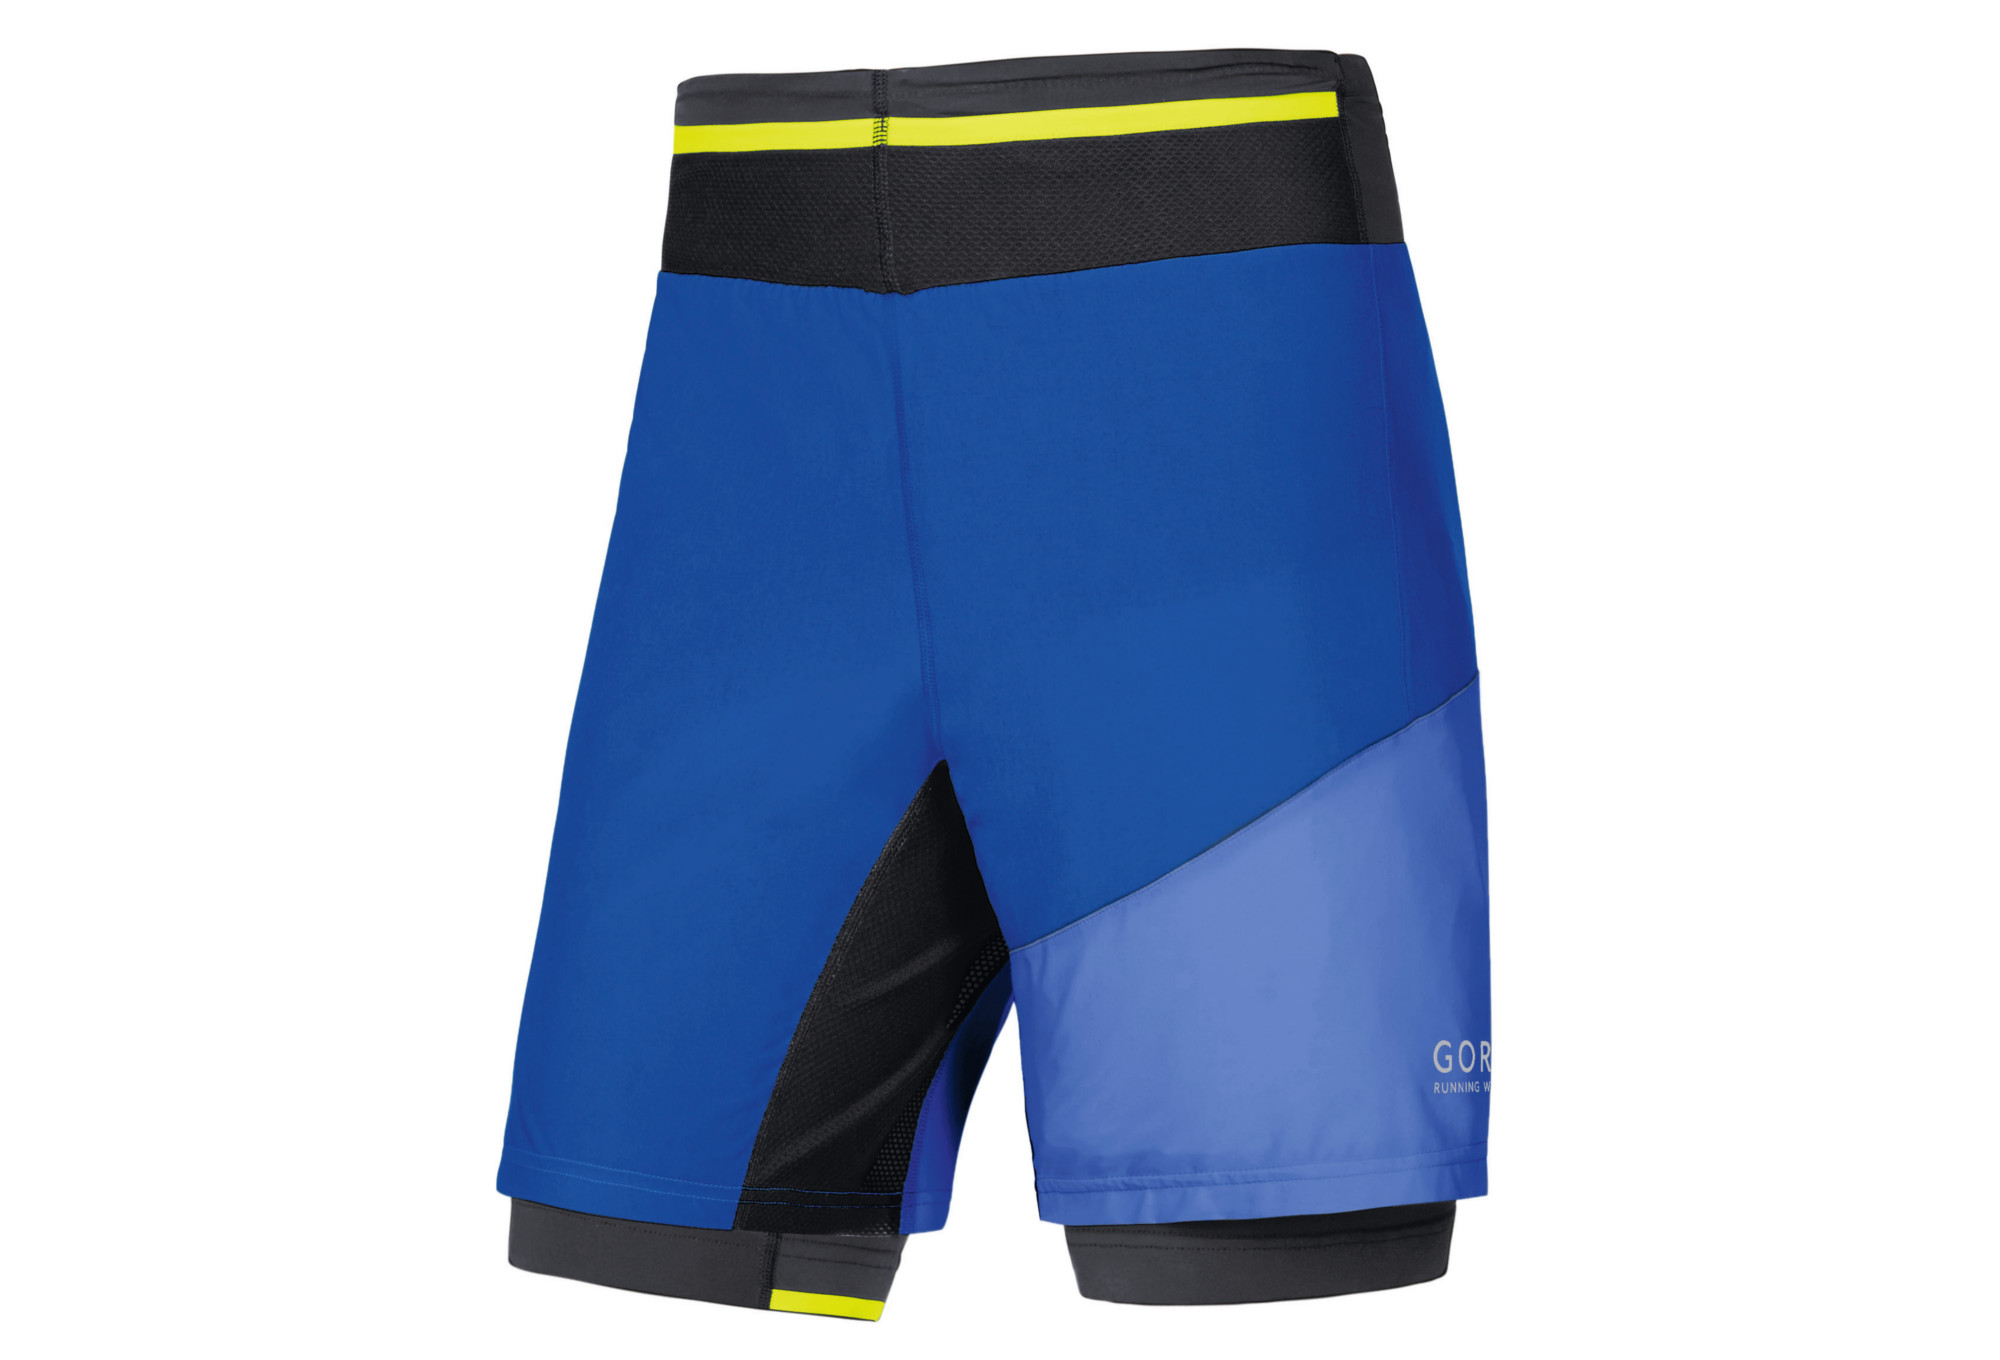 GORE RUNNING WEAR 2-in-1 Short FUSION Blue  40a64f9cf03